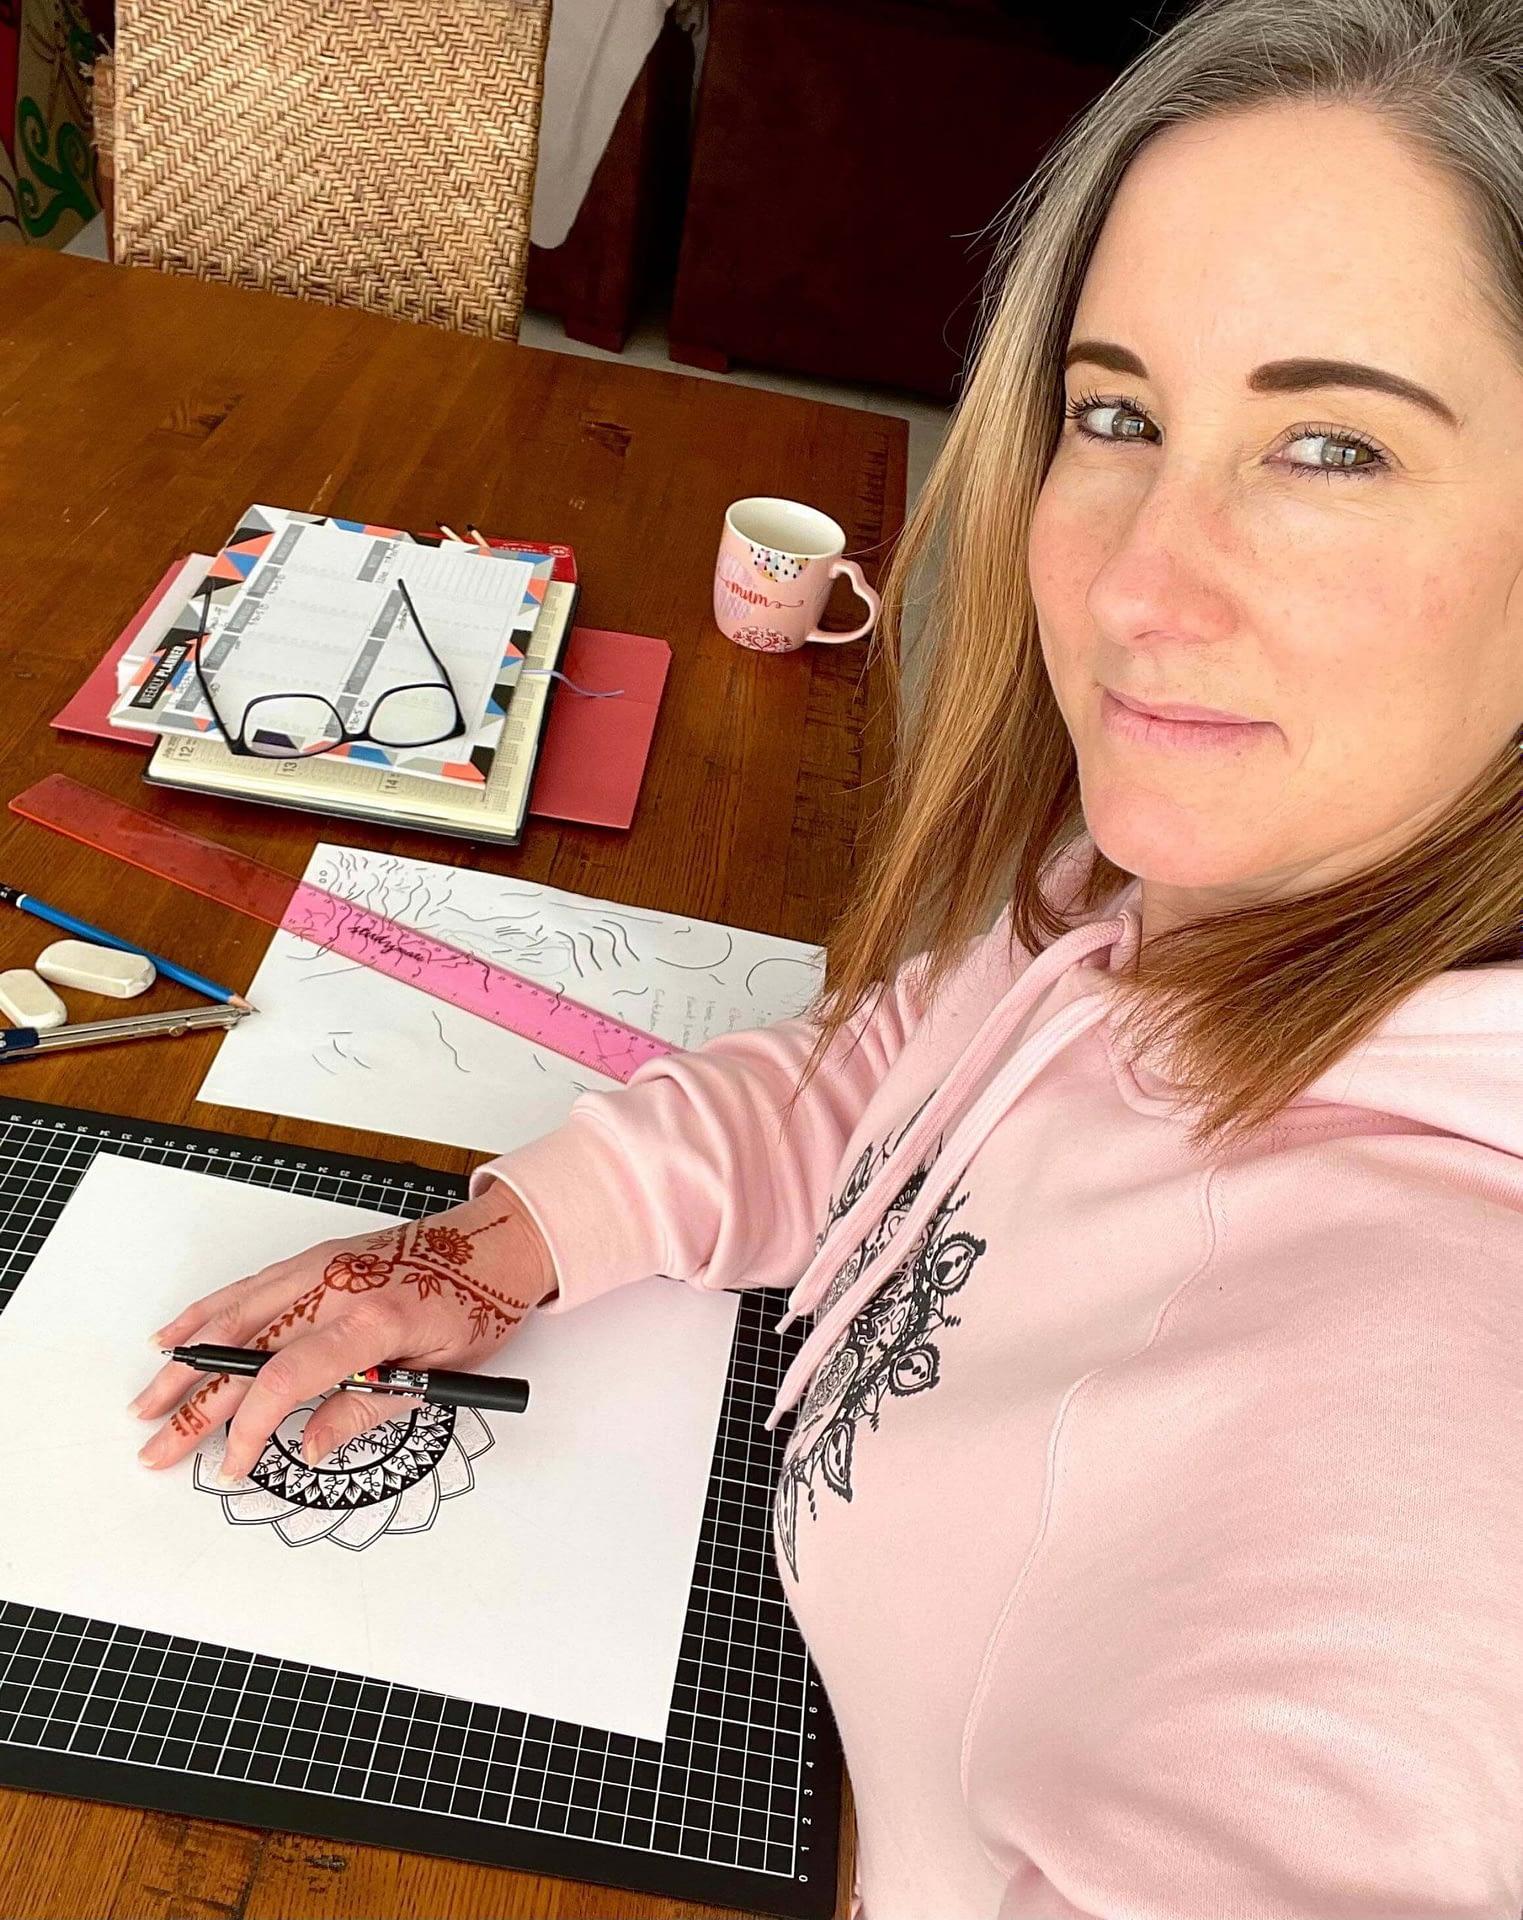 Samantha creating her beautiful artwork!